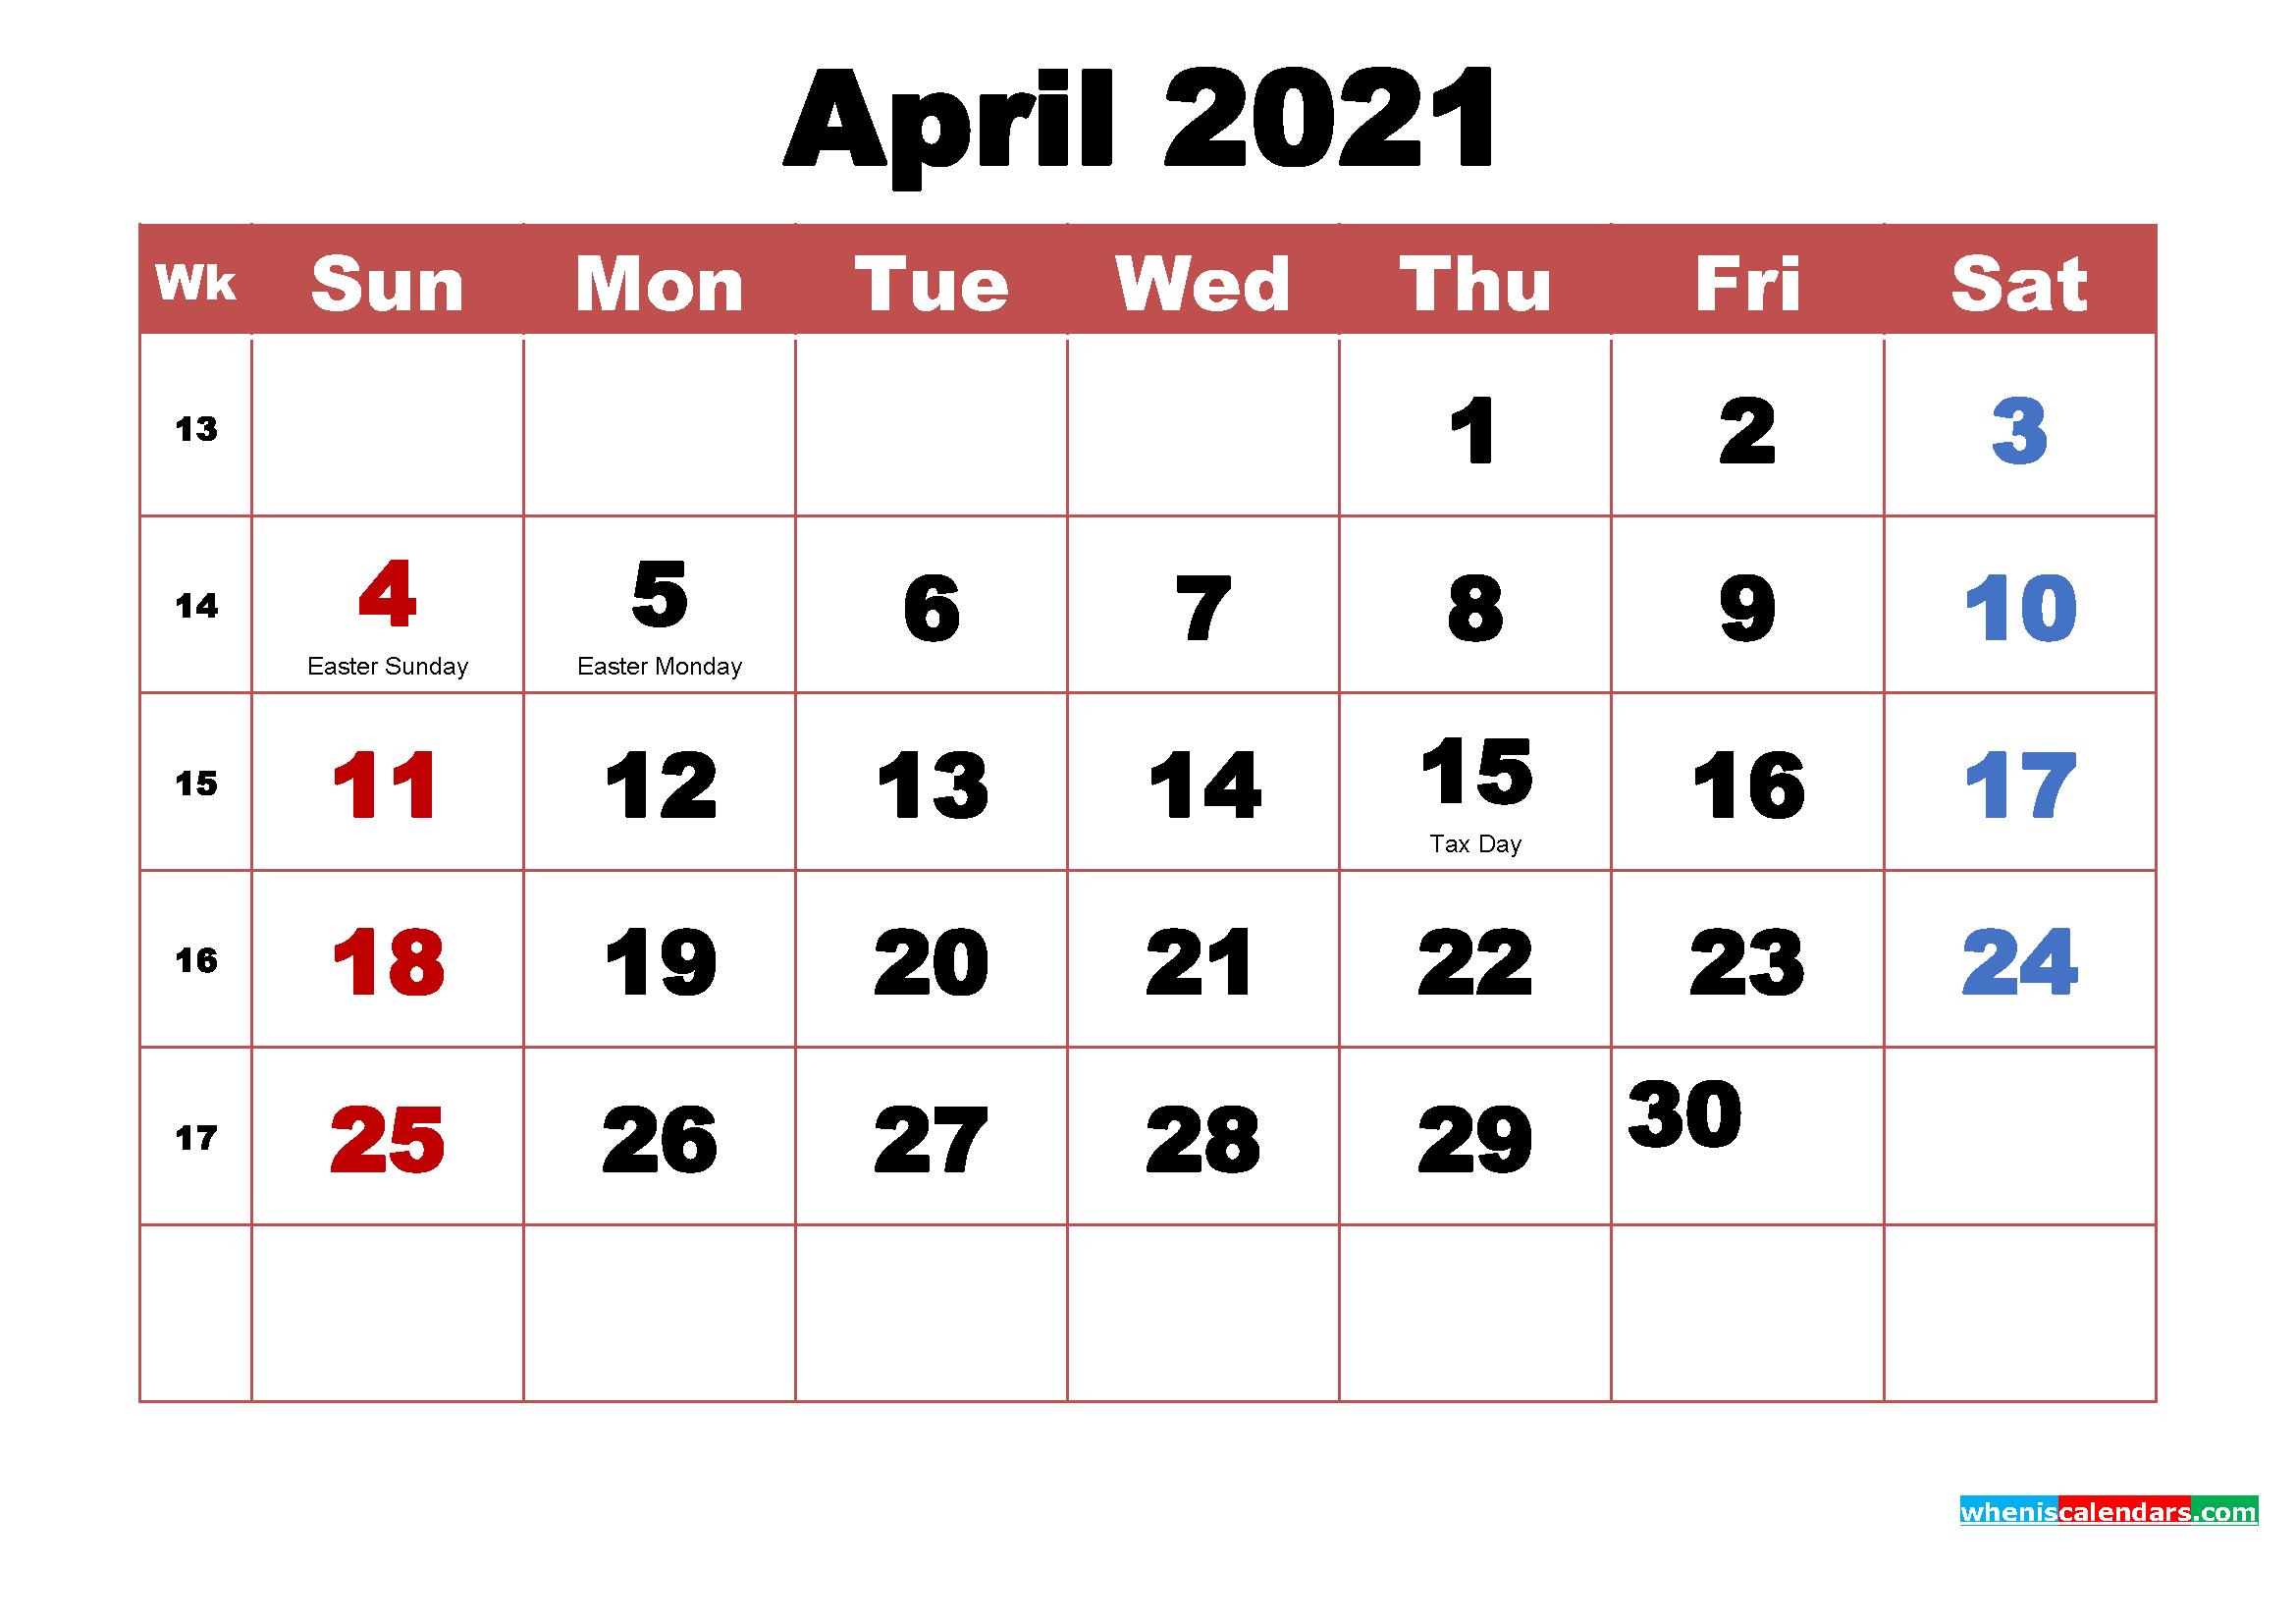 April 2021 Calendar Wallpaper High Resolution Printable 2339x1654